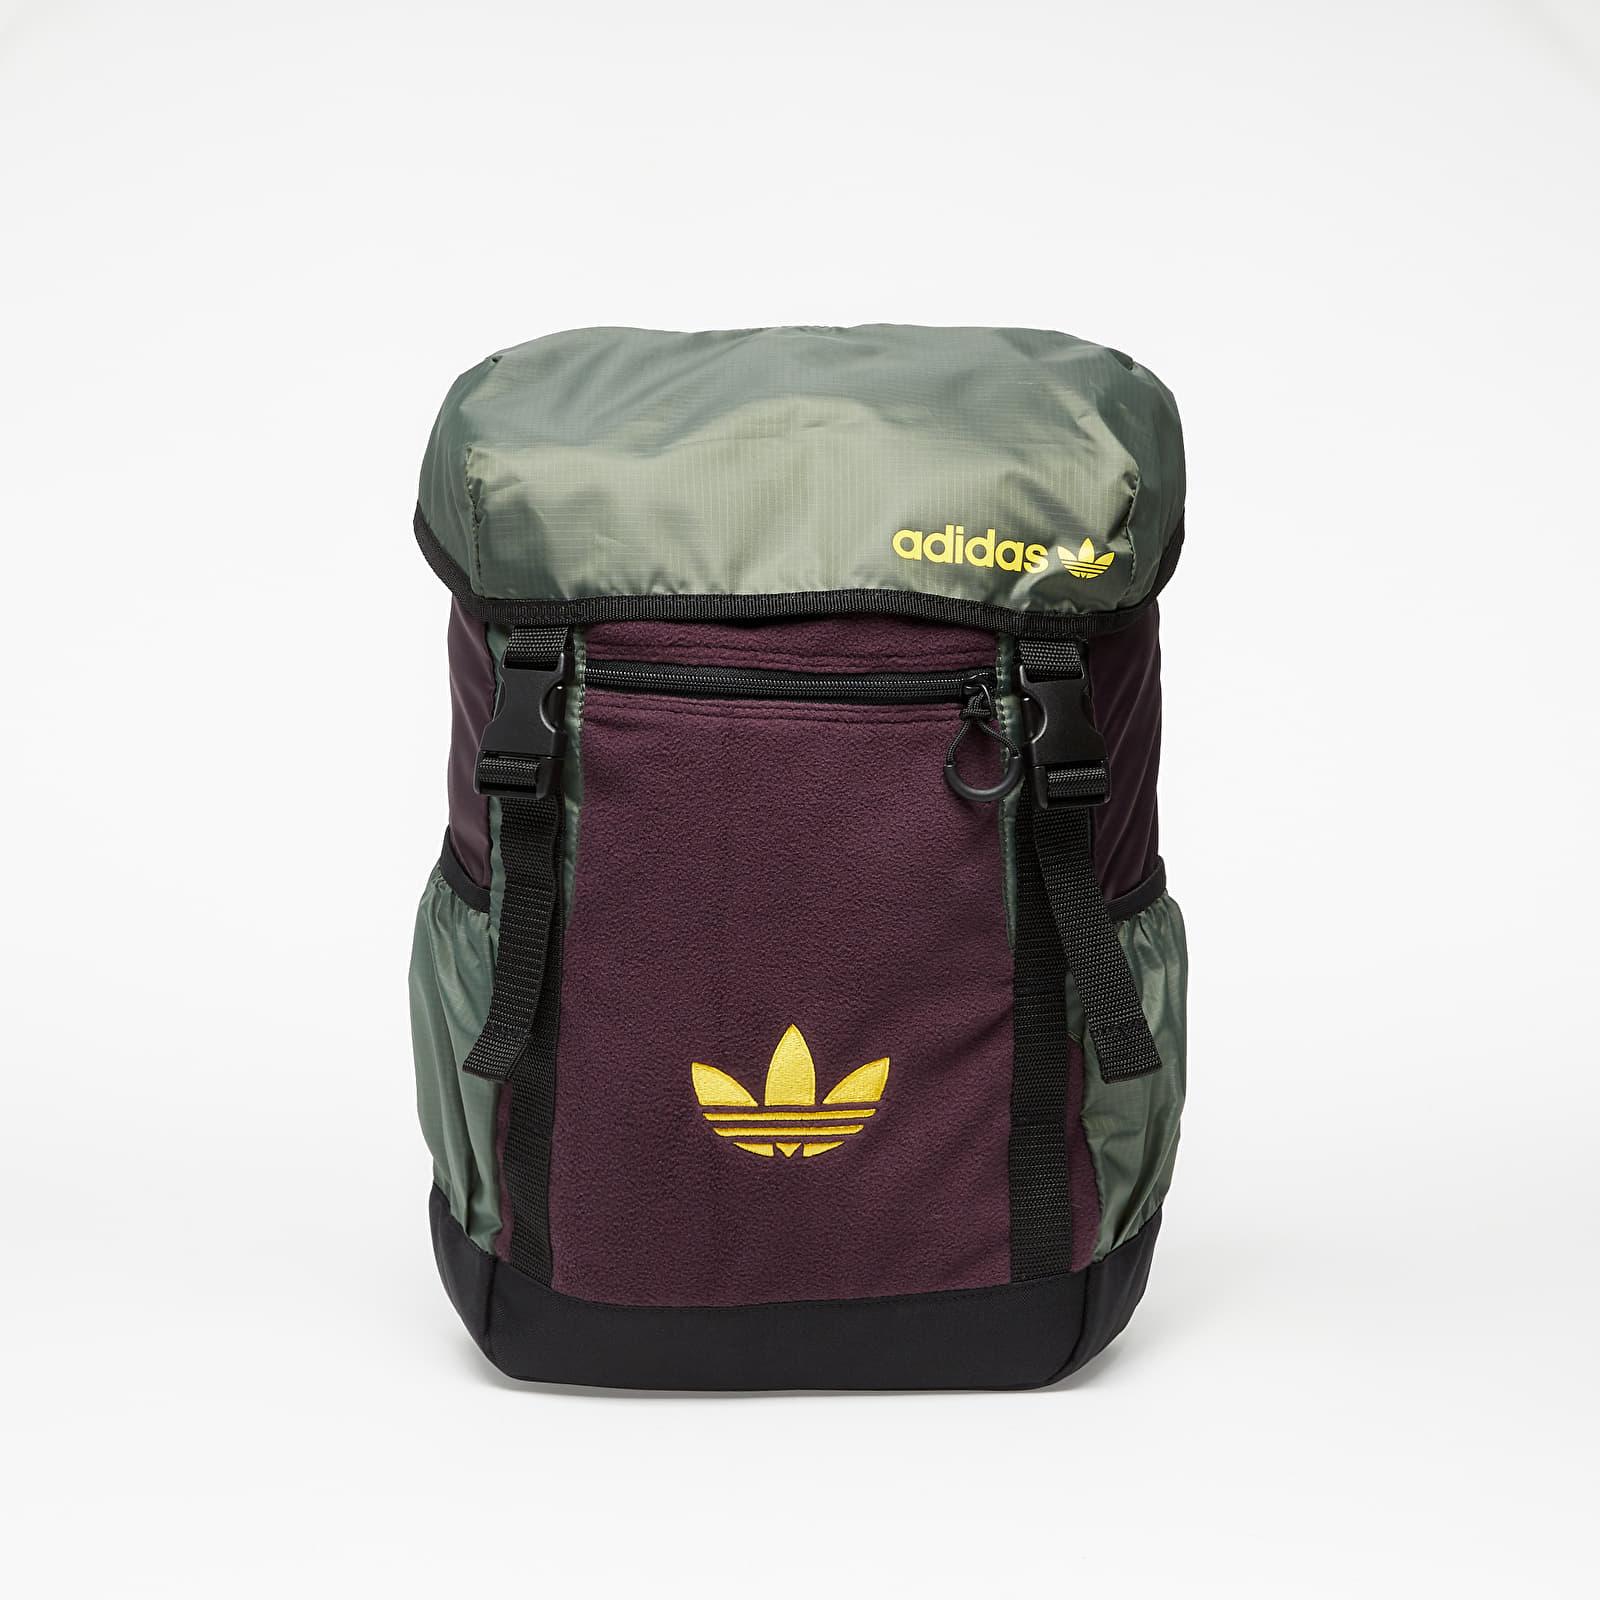 Backpacks adidas Premium Essentials Toploader Backpack Minred/ Basgrn